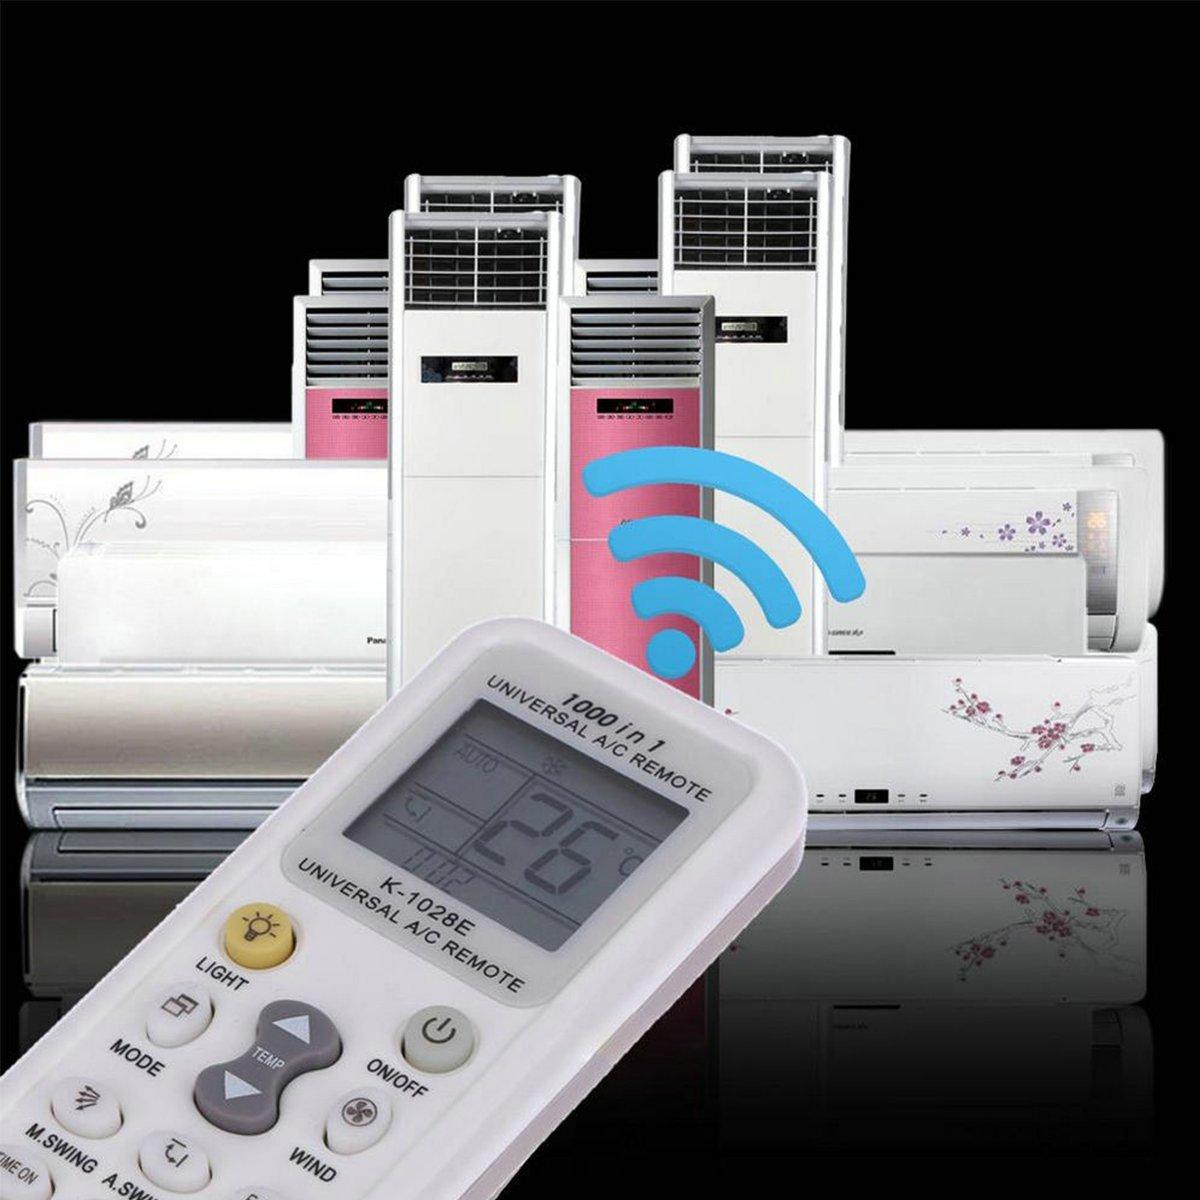 Coyaho Universal Air Conditioner Remote Control for Daikin, Hitachi